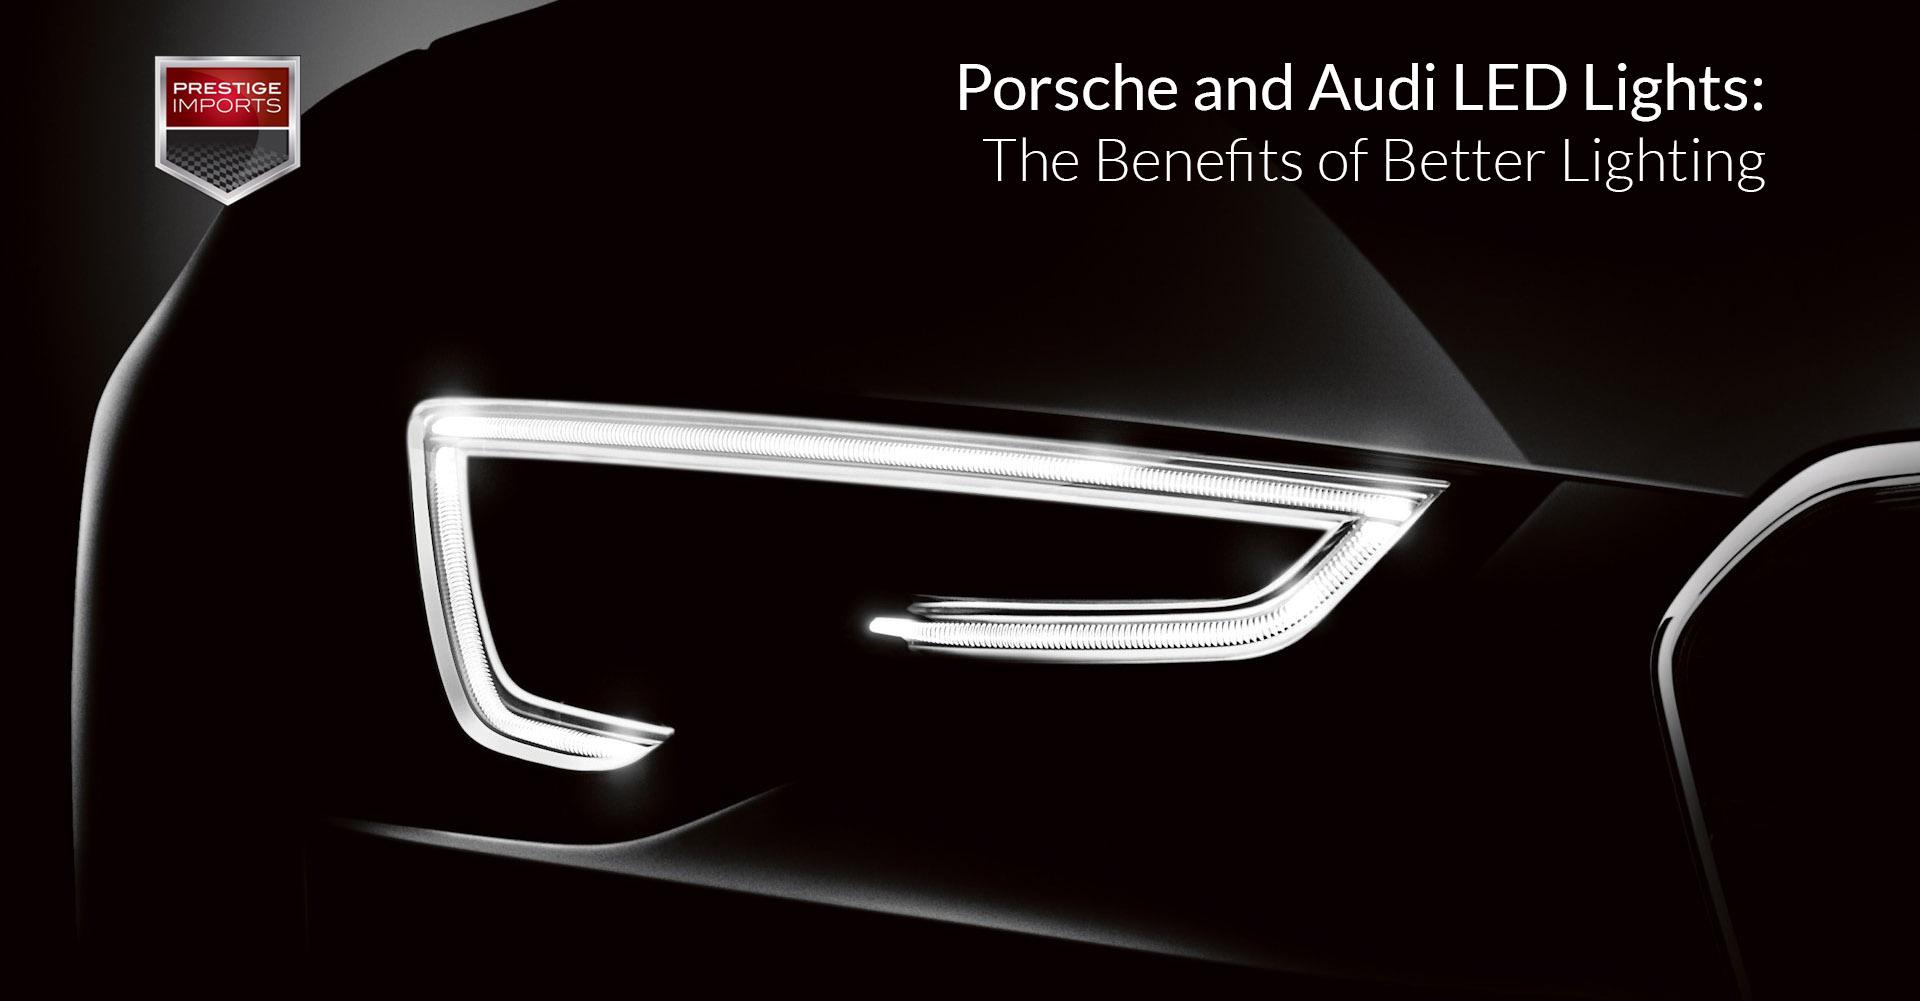 Porsche and Audi LED Lights -The Benefits of Better Lighting